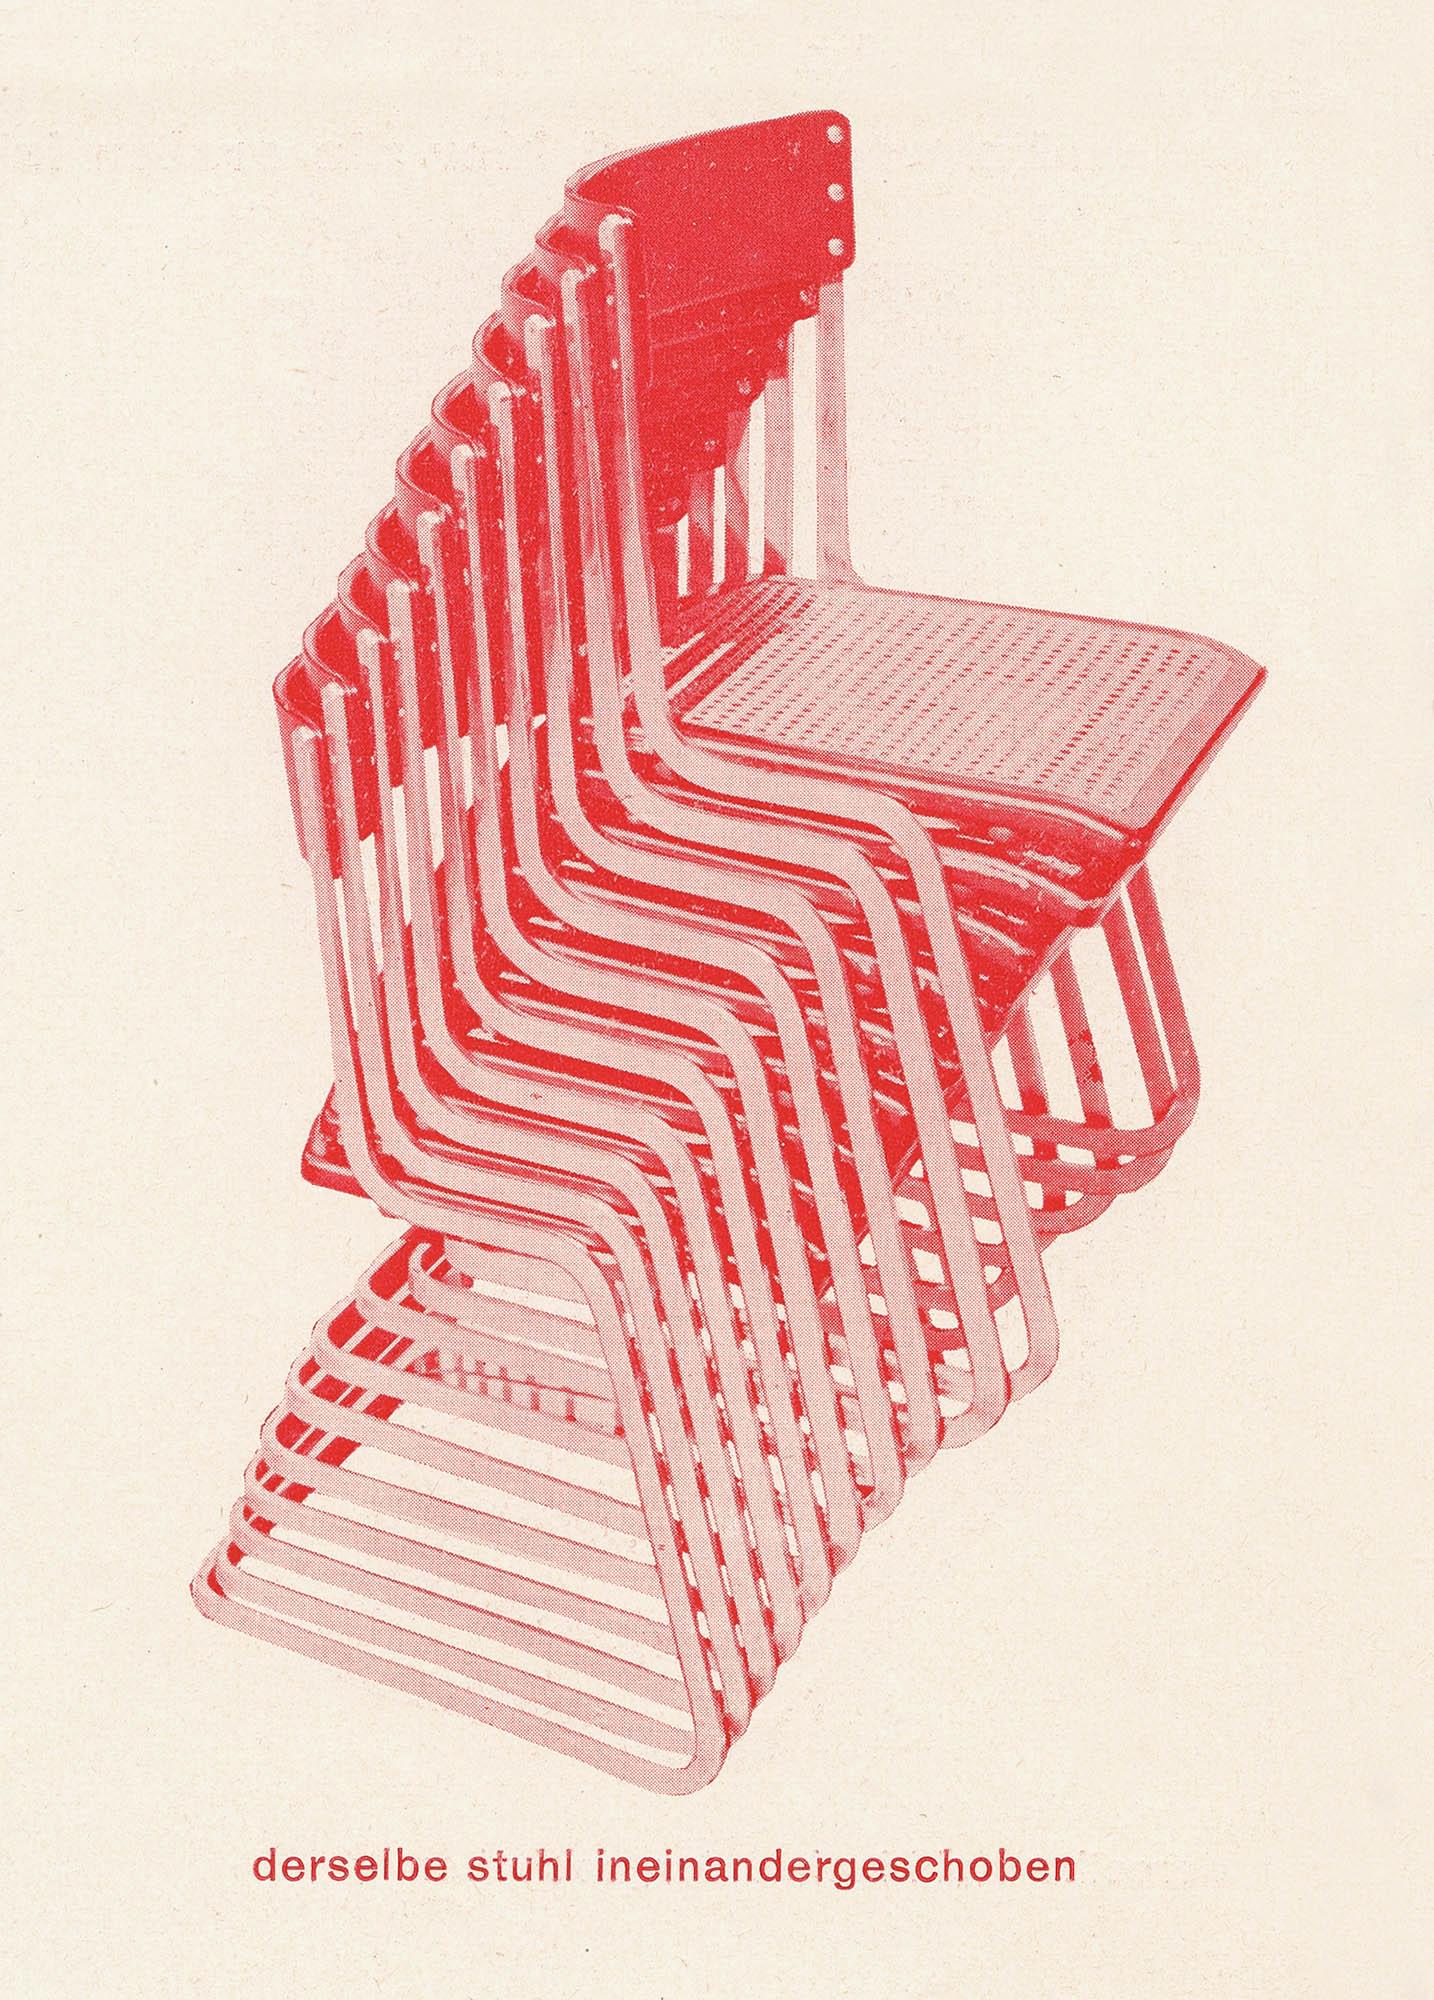 Wohnbedarf Modell 7, Exemplar Sigfried Giedion Flora Steiger-Crawford